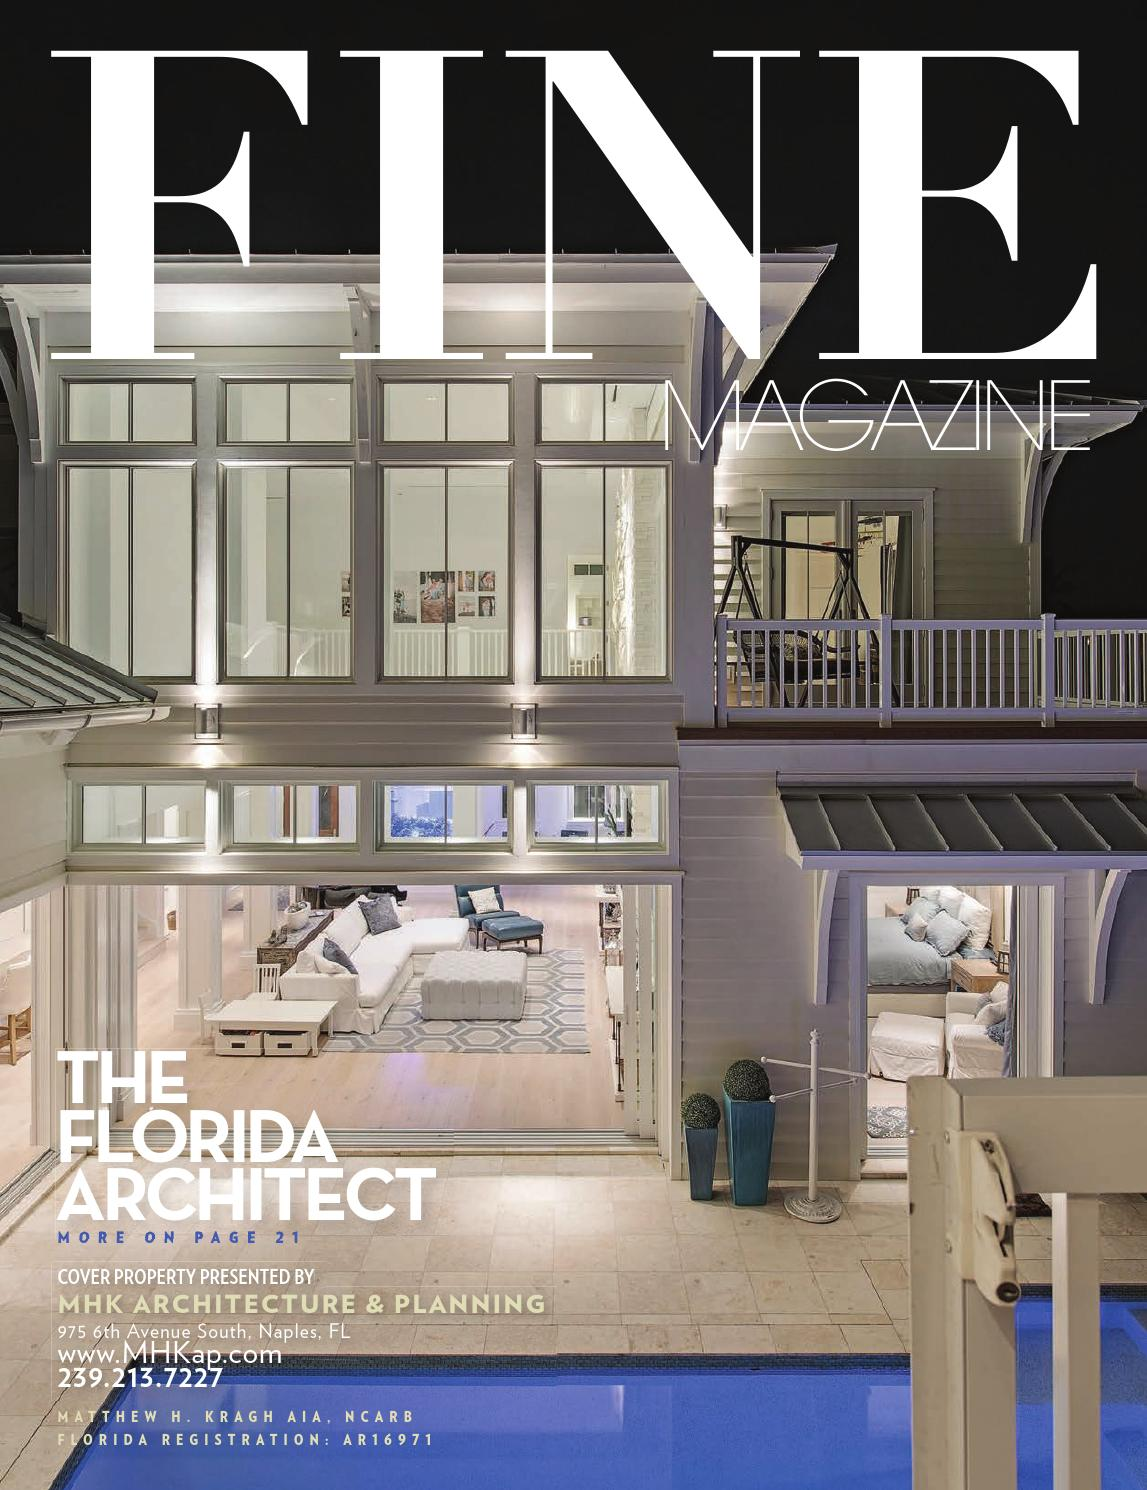 FINE Magazine April 2016 by FINE Magazine Naples FL issuu